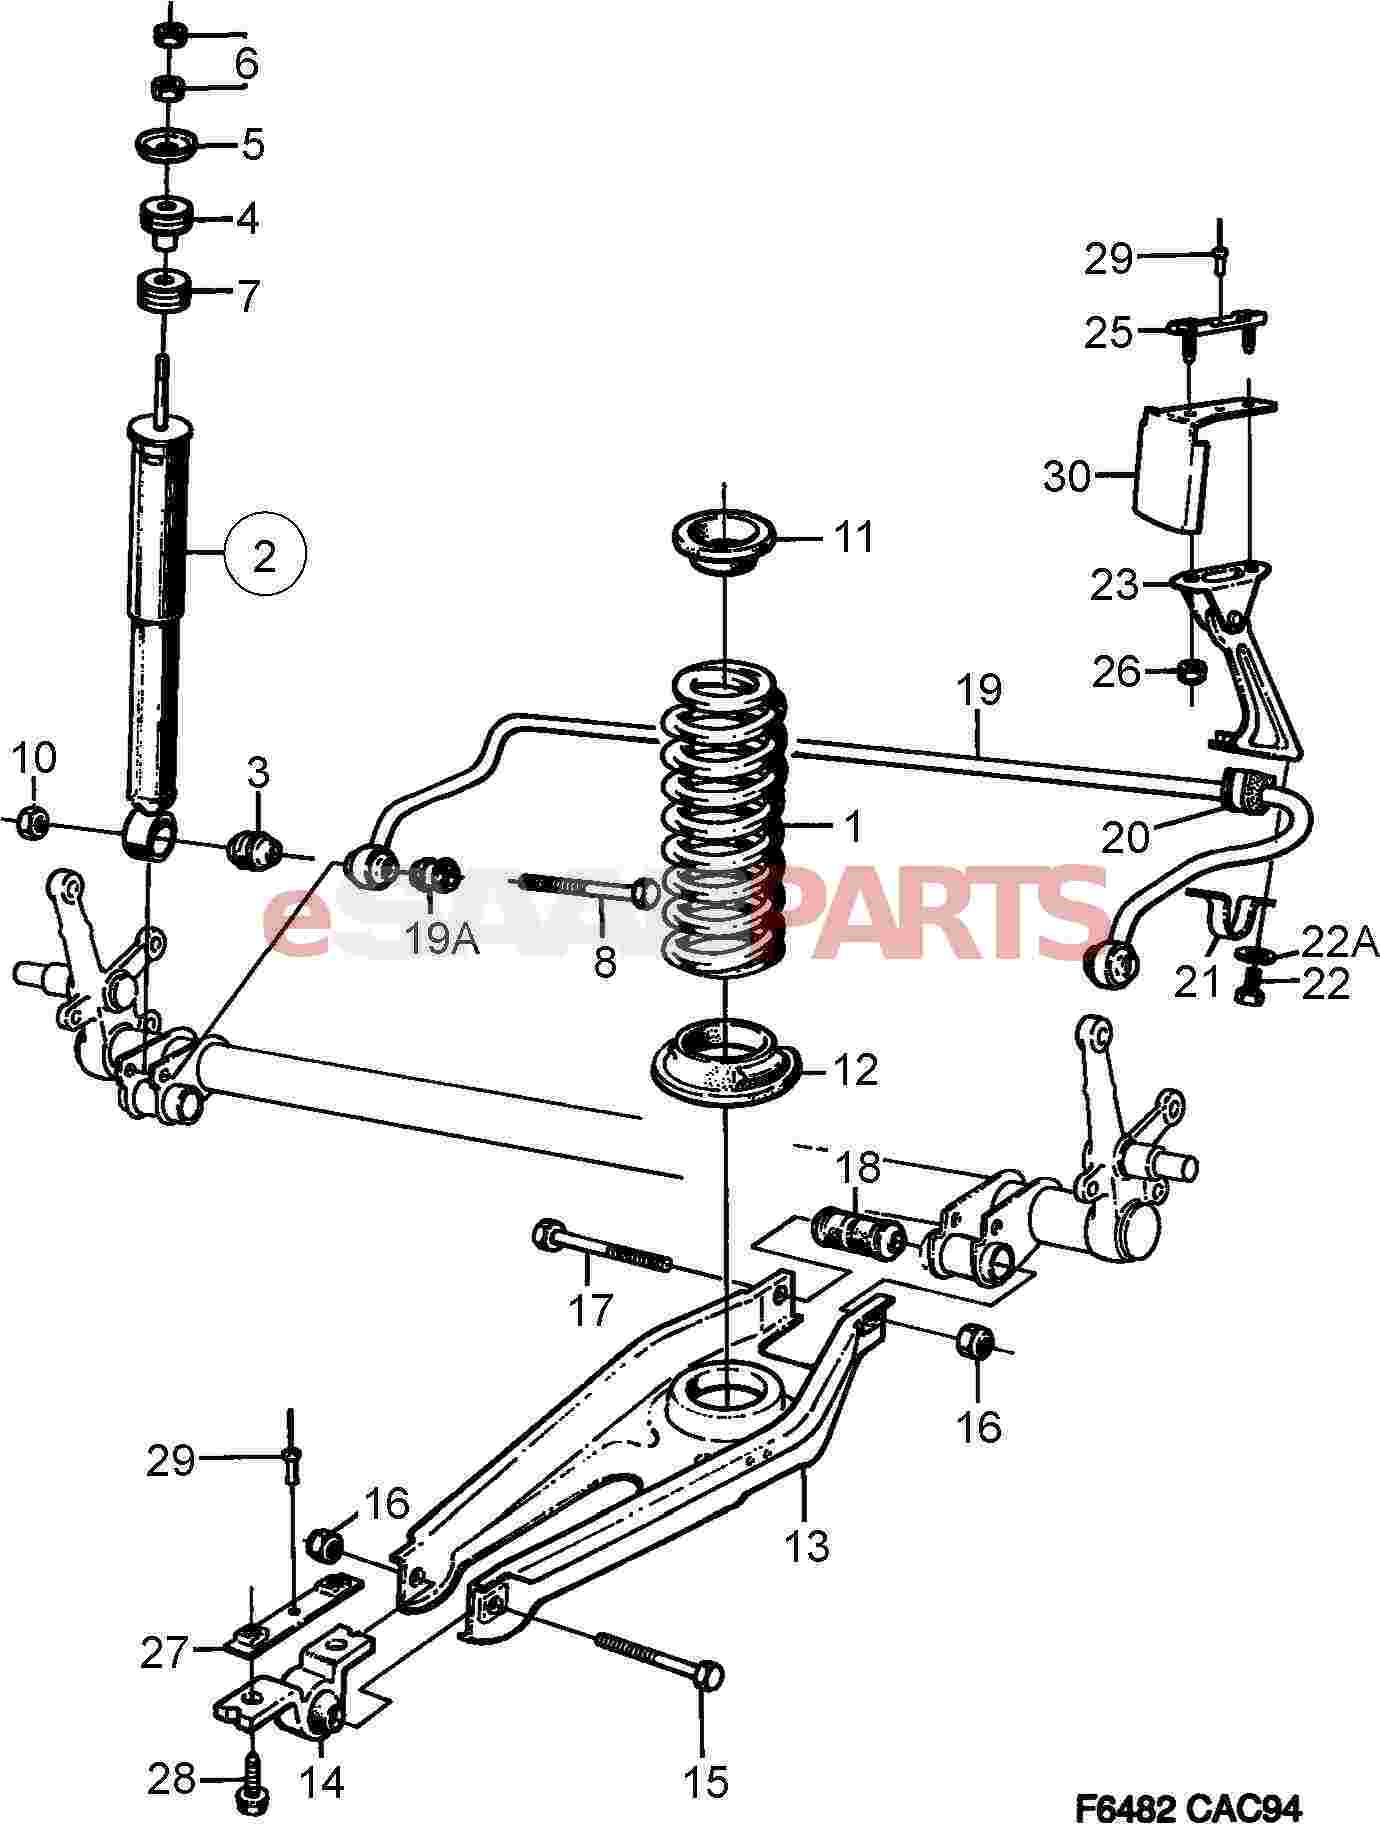 shock absorber diagram [4645008] saab shock absorber kit - genuine saab parts ...